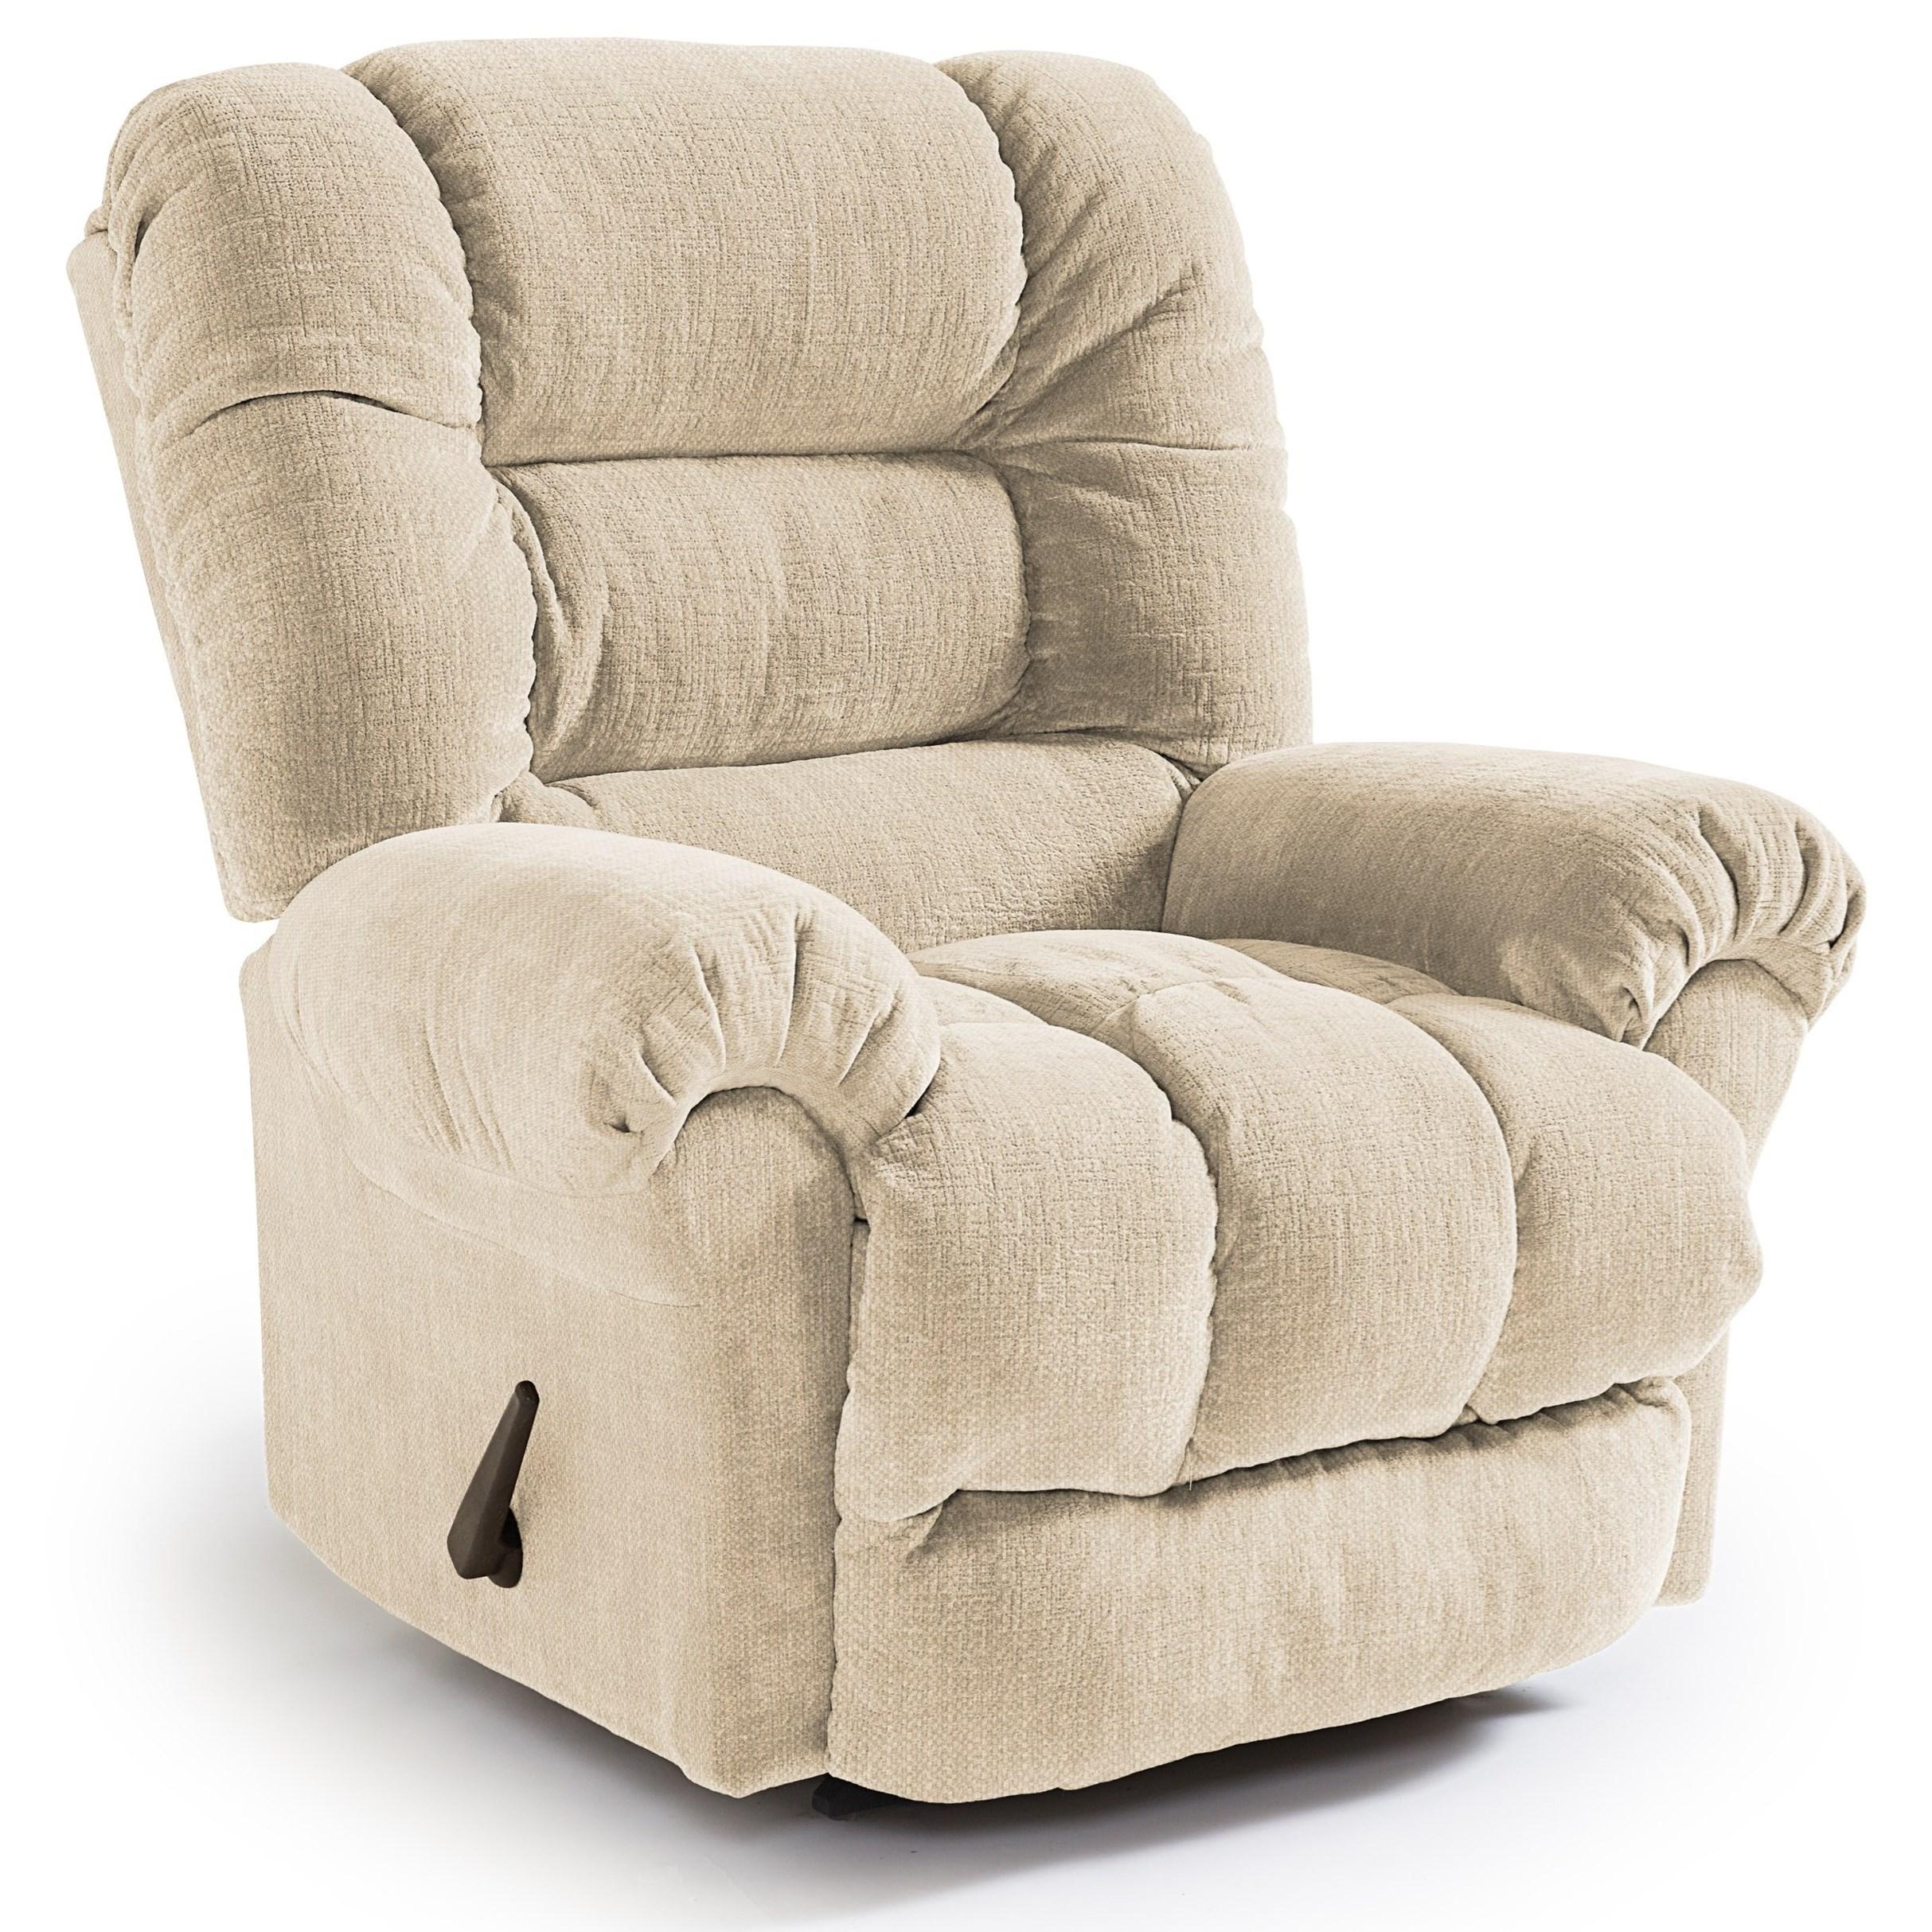 Medium Recliners Seger Swivel Rocker Recliner by Best Home Furnishings at Turk Furniture